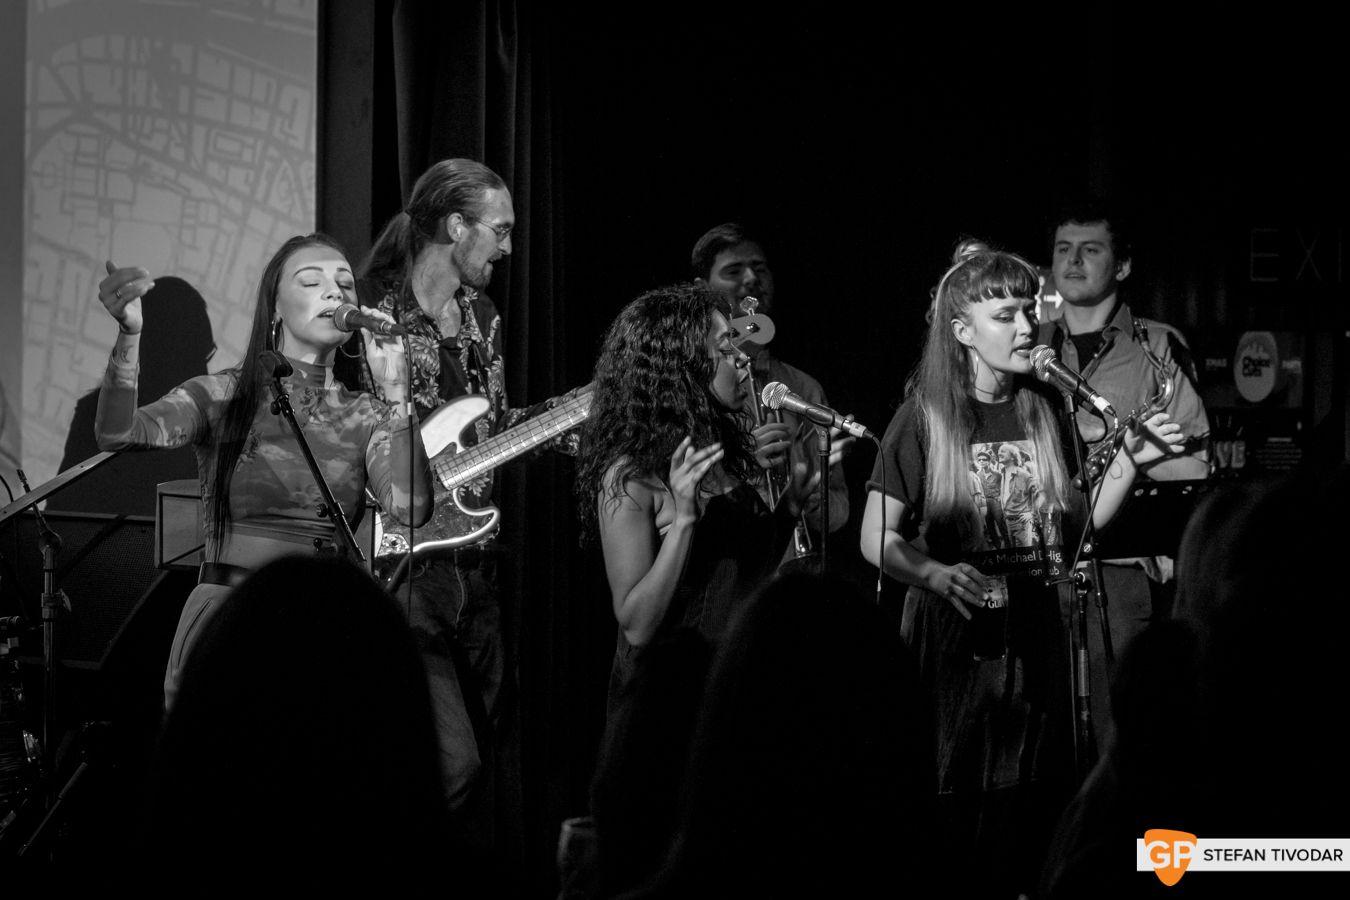 Melina Malone GoldenPlec Bloc Party Jam 2018 Sugar Club 4